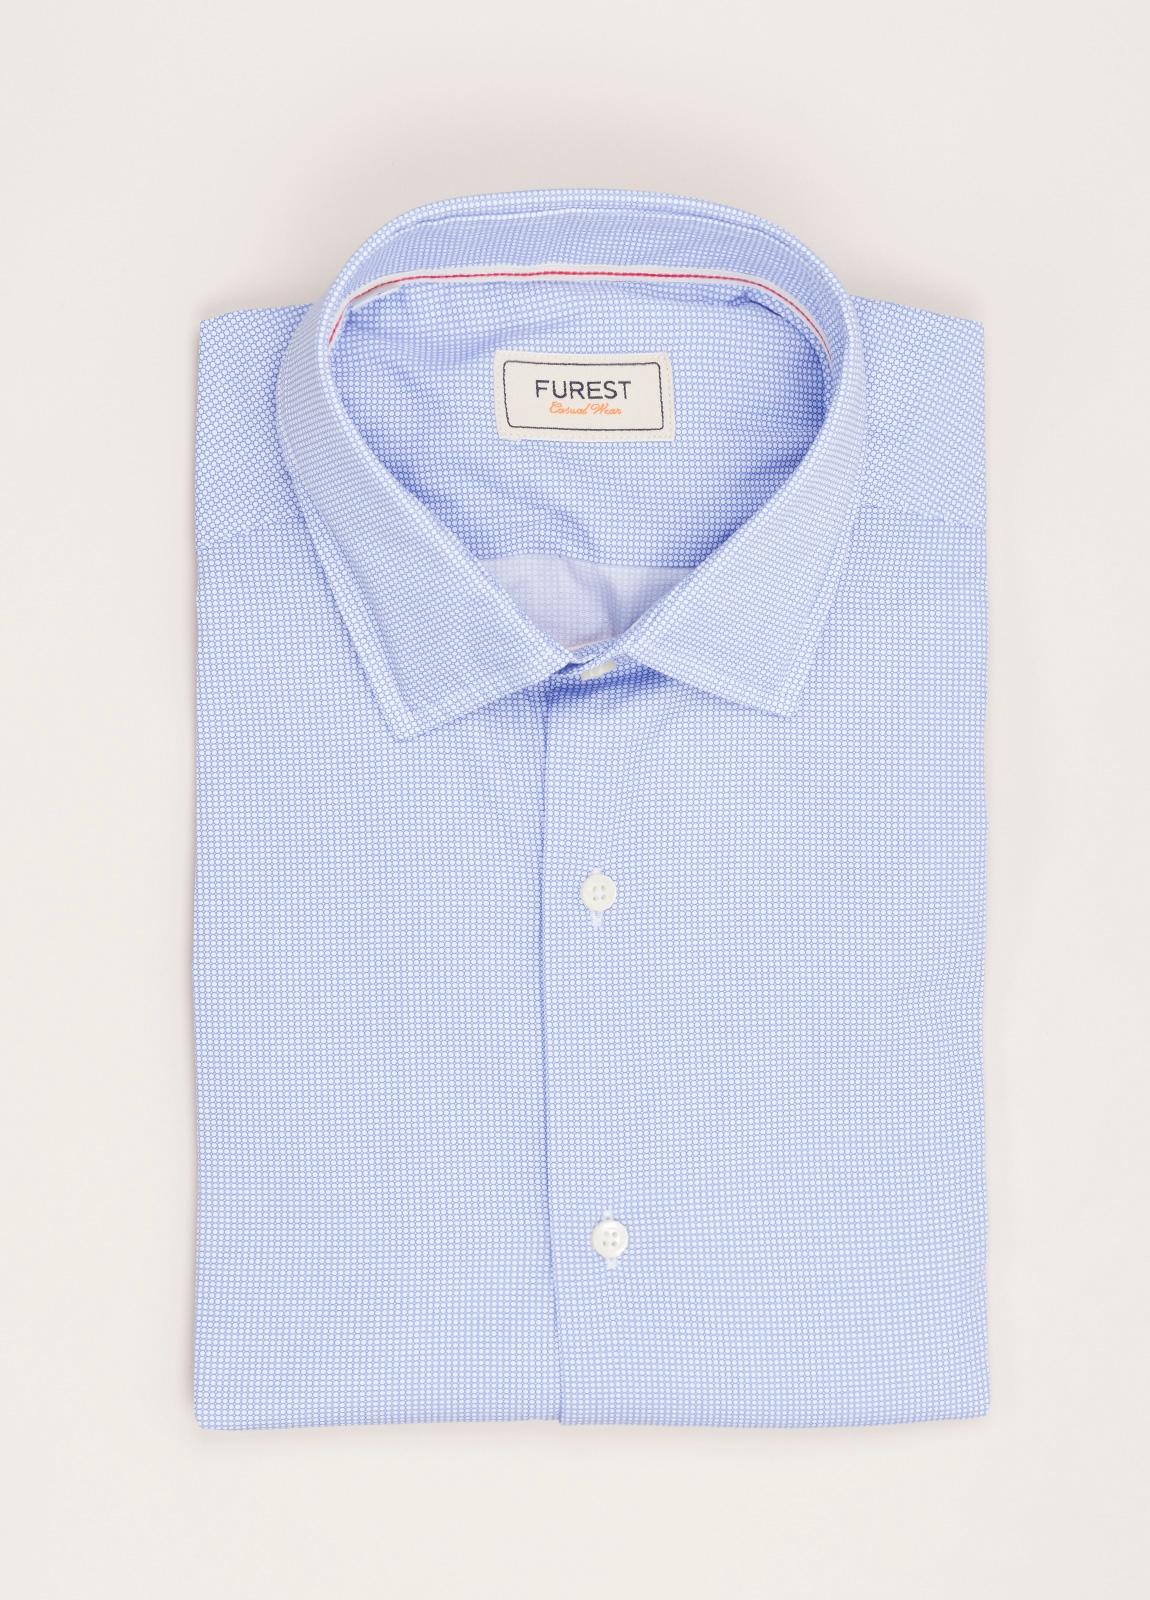 Camisa Casual Wear FUREST COLECCIÓN slim fit dibujo celeste